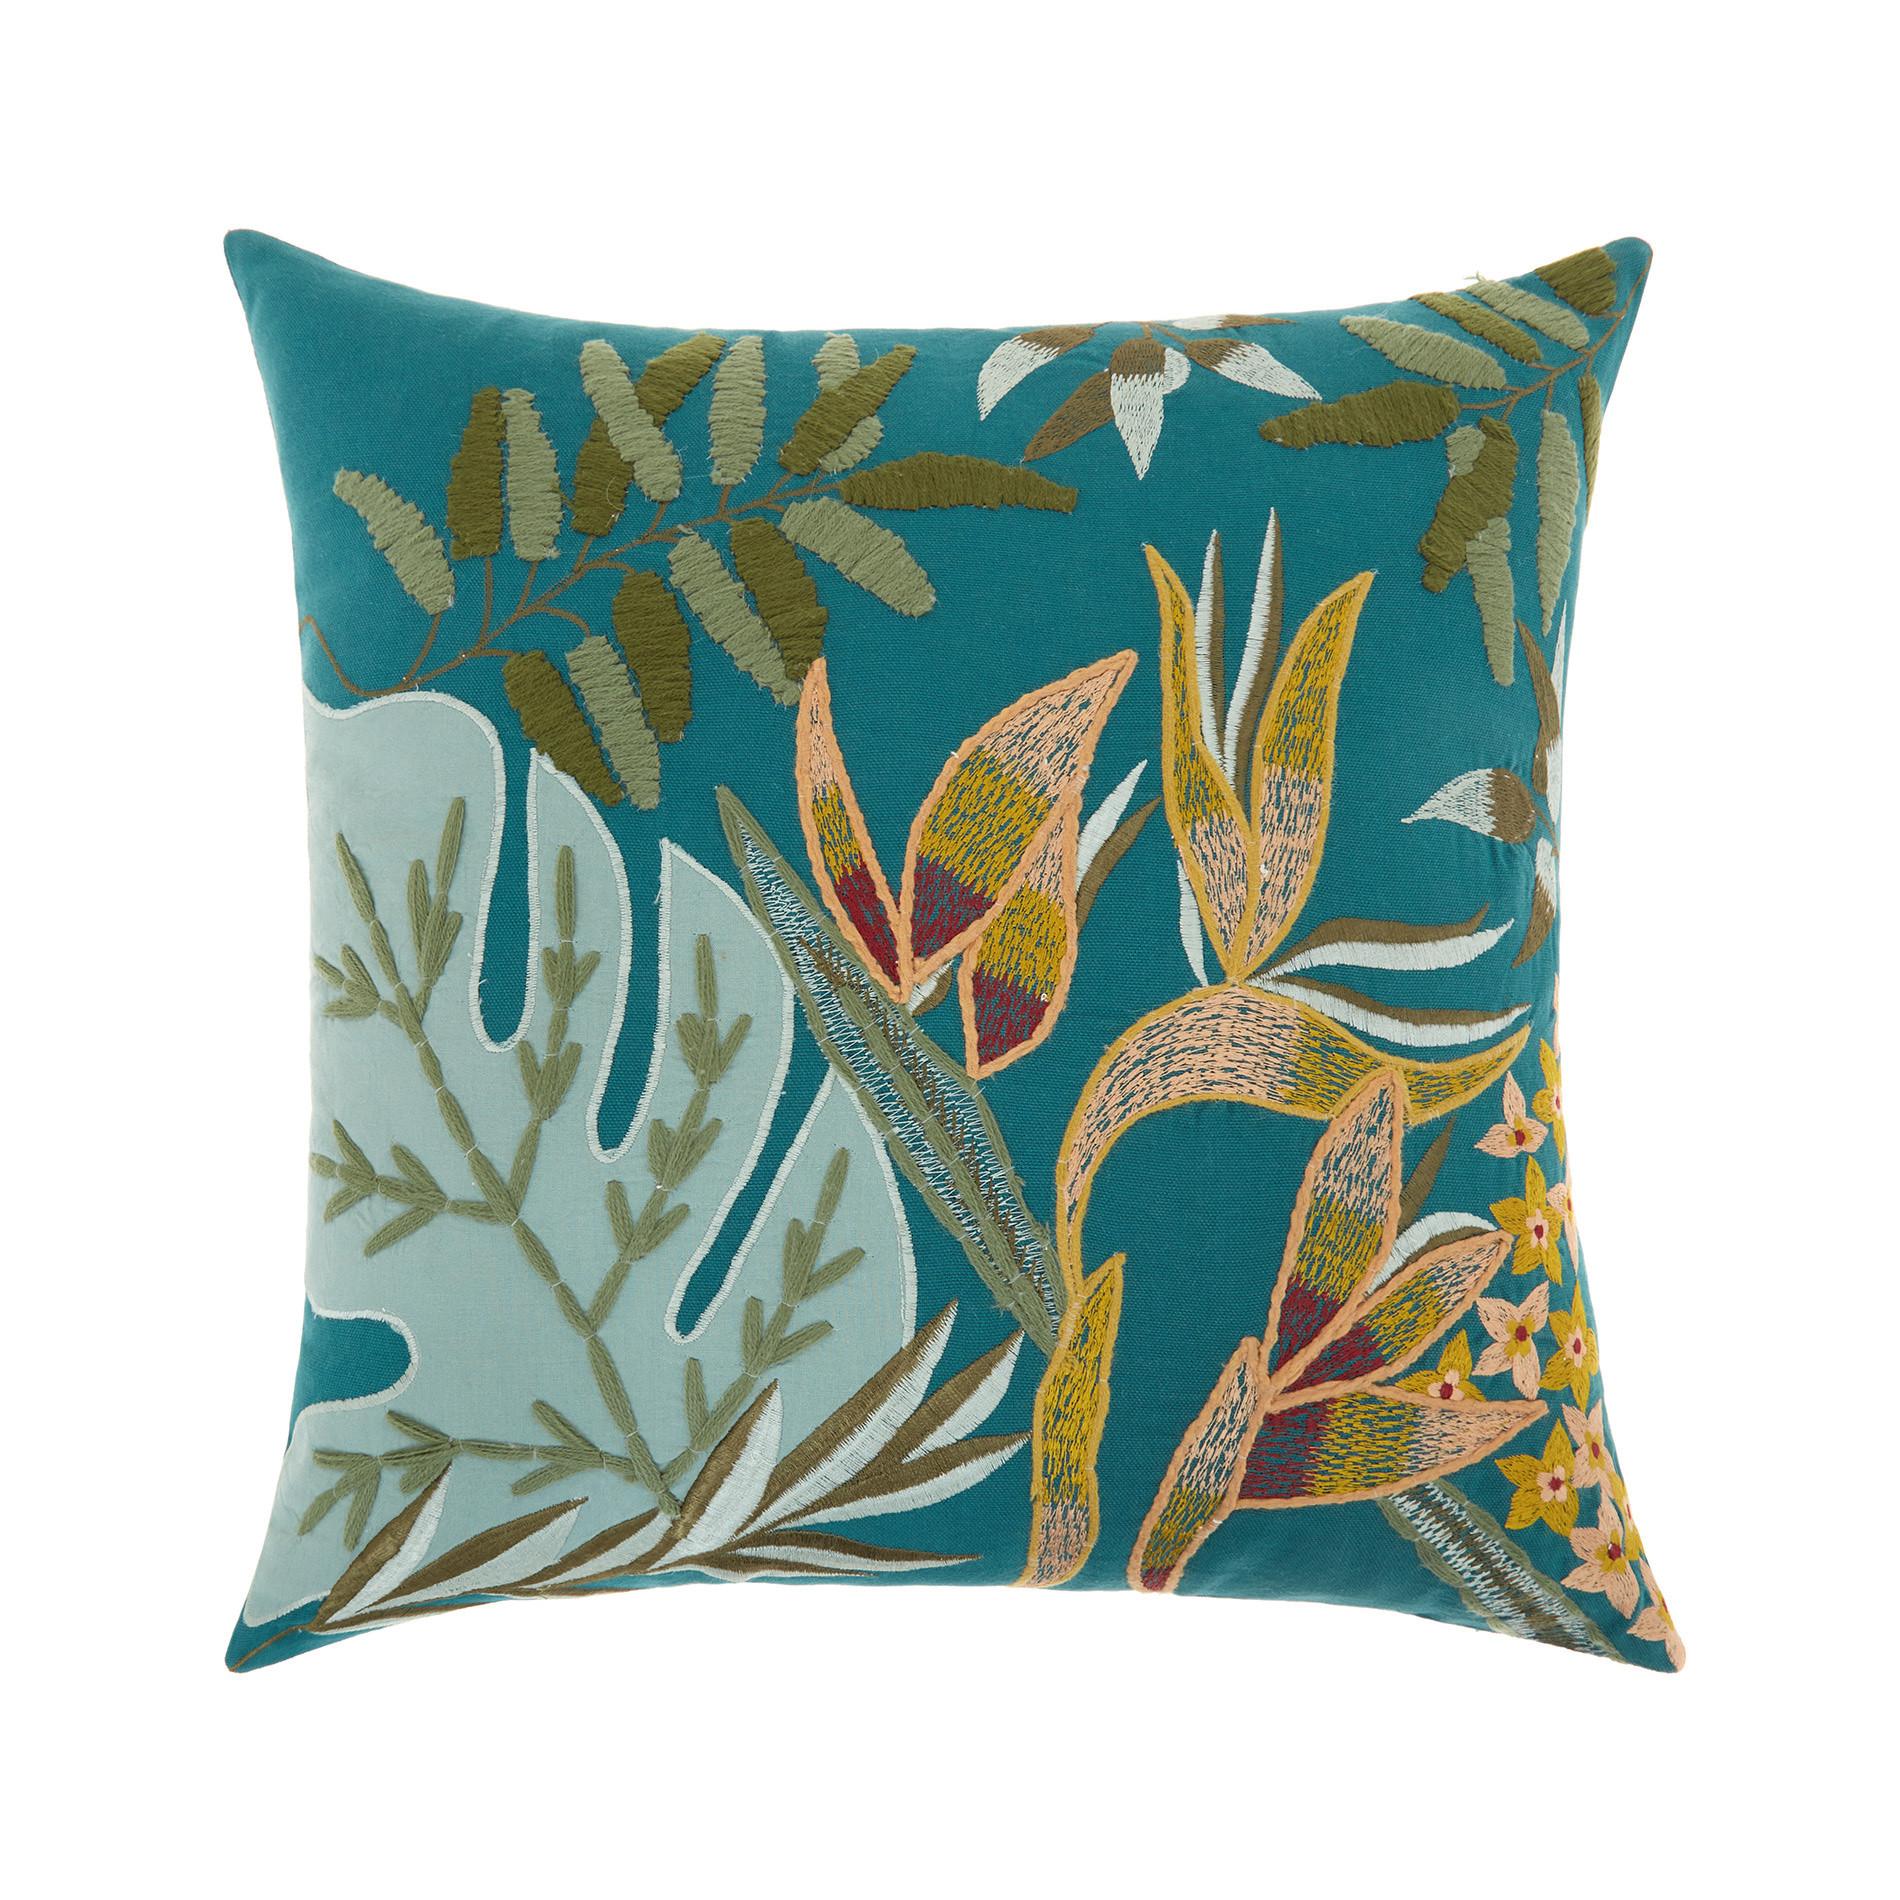 Cuscino ricamo foglie 45x45cm, Verde smeraldo, large image number 0